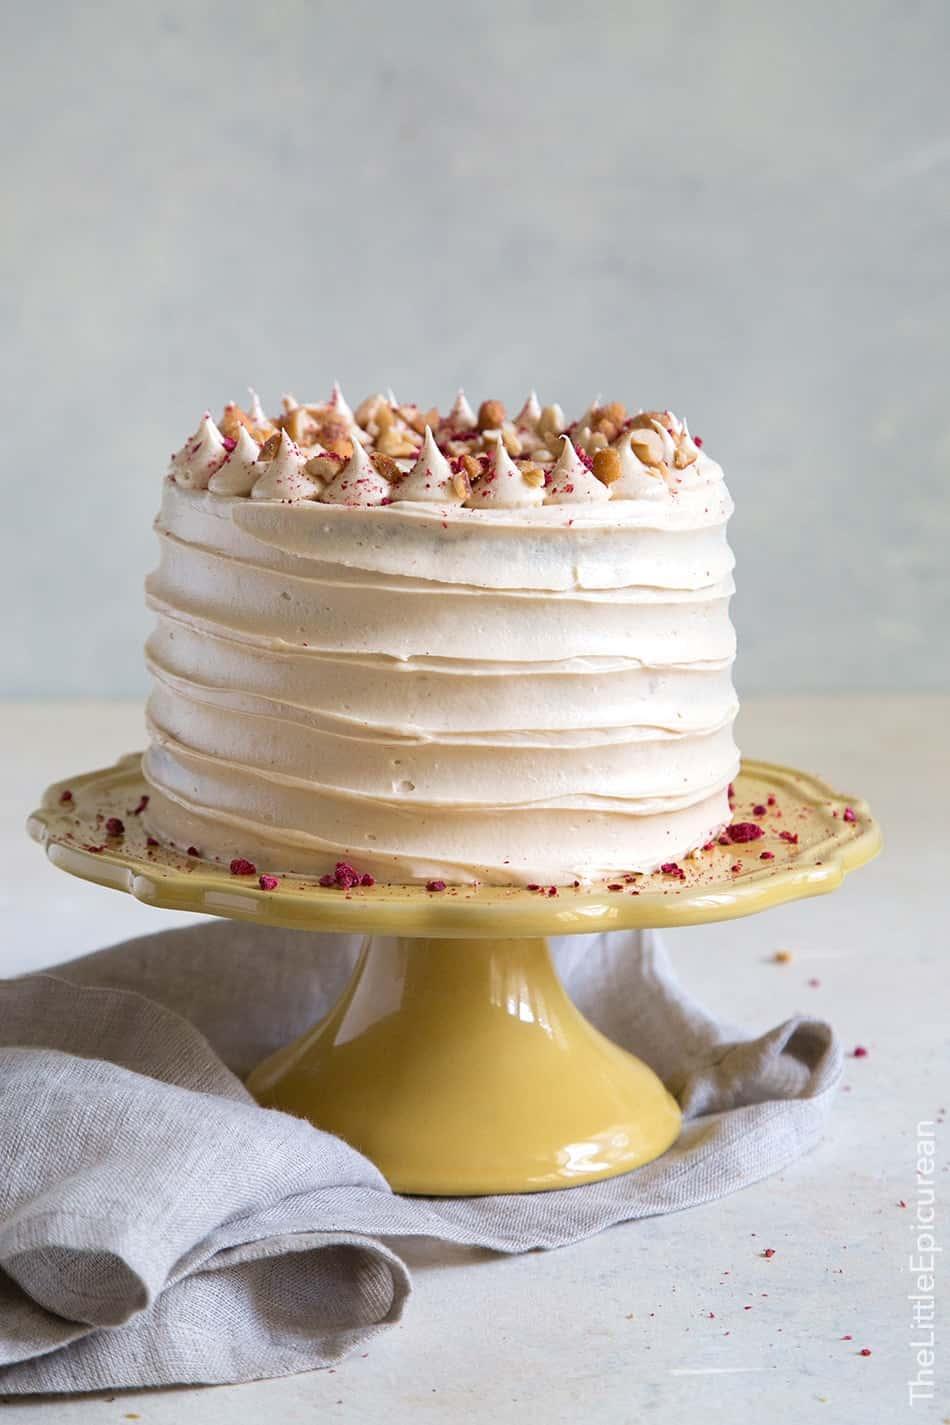 Banana Peanut Butter Jelly Cake